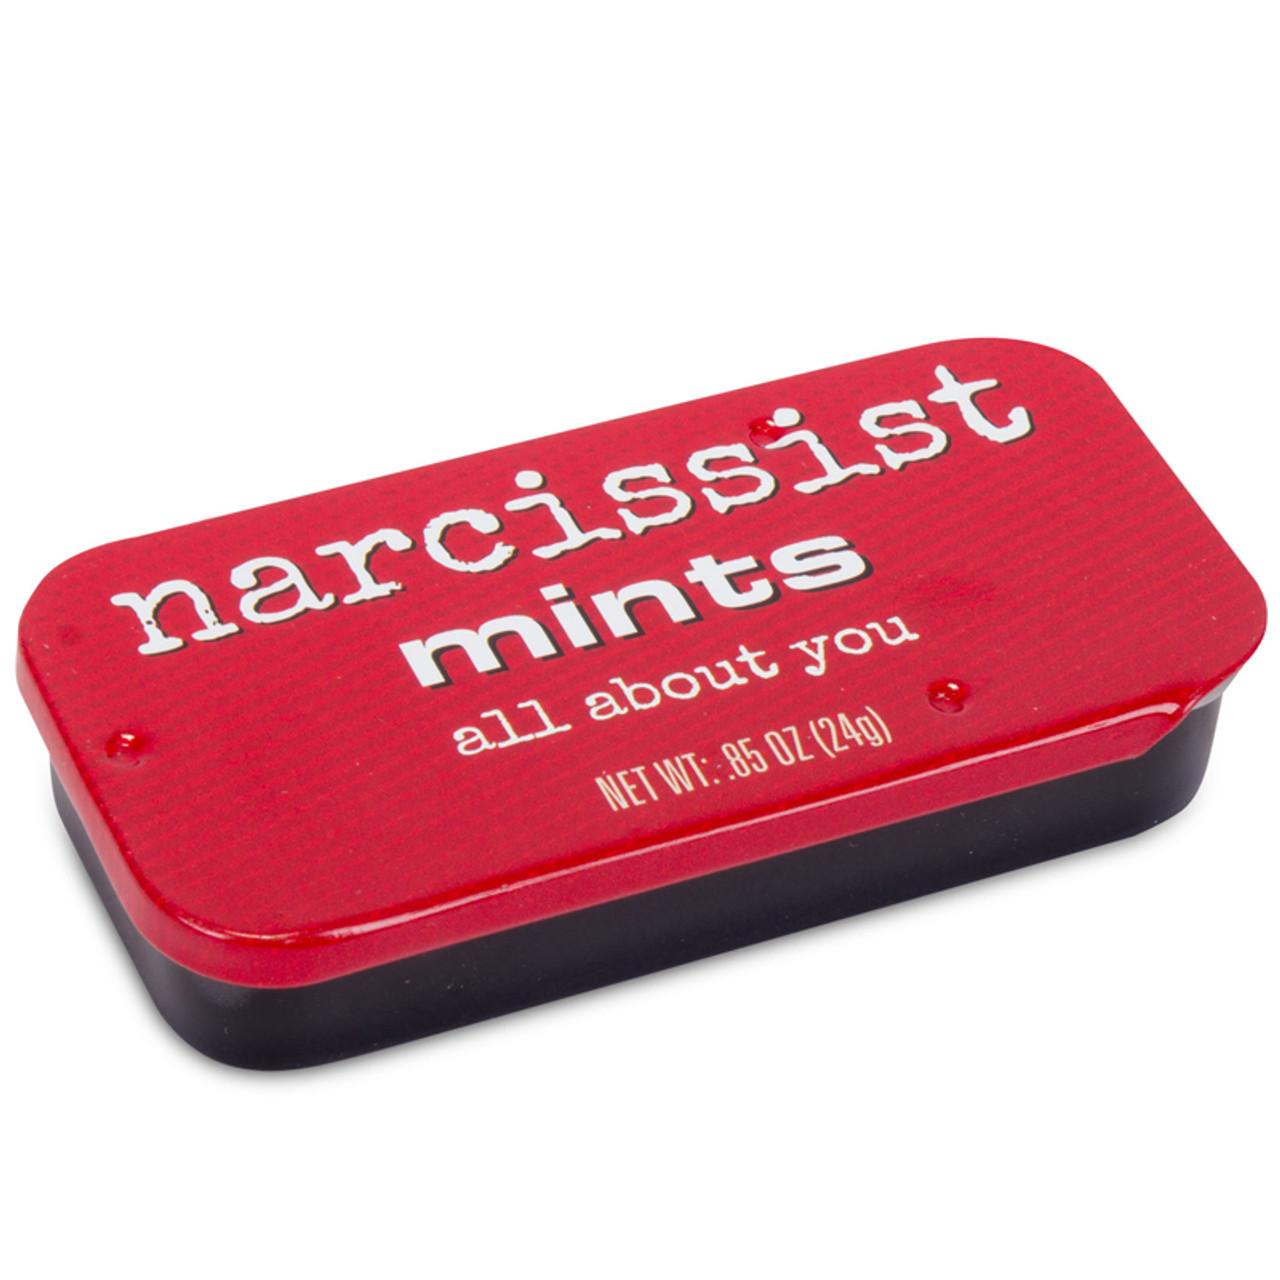 Narcissist Mints